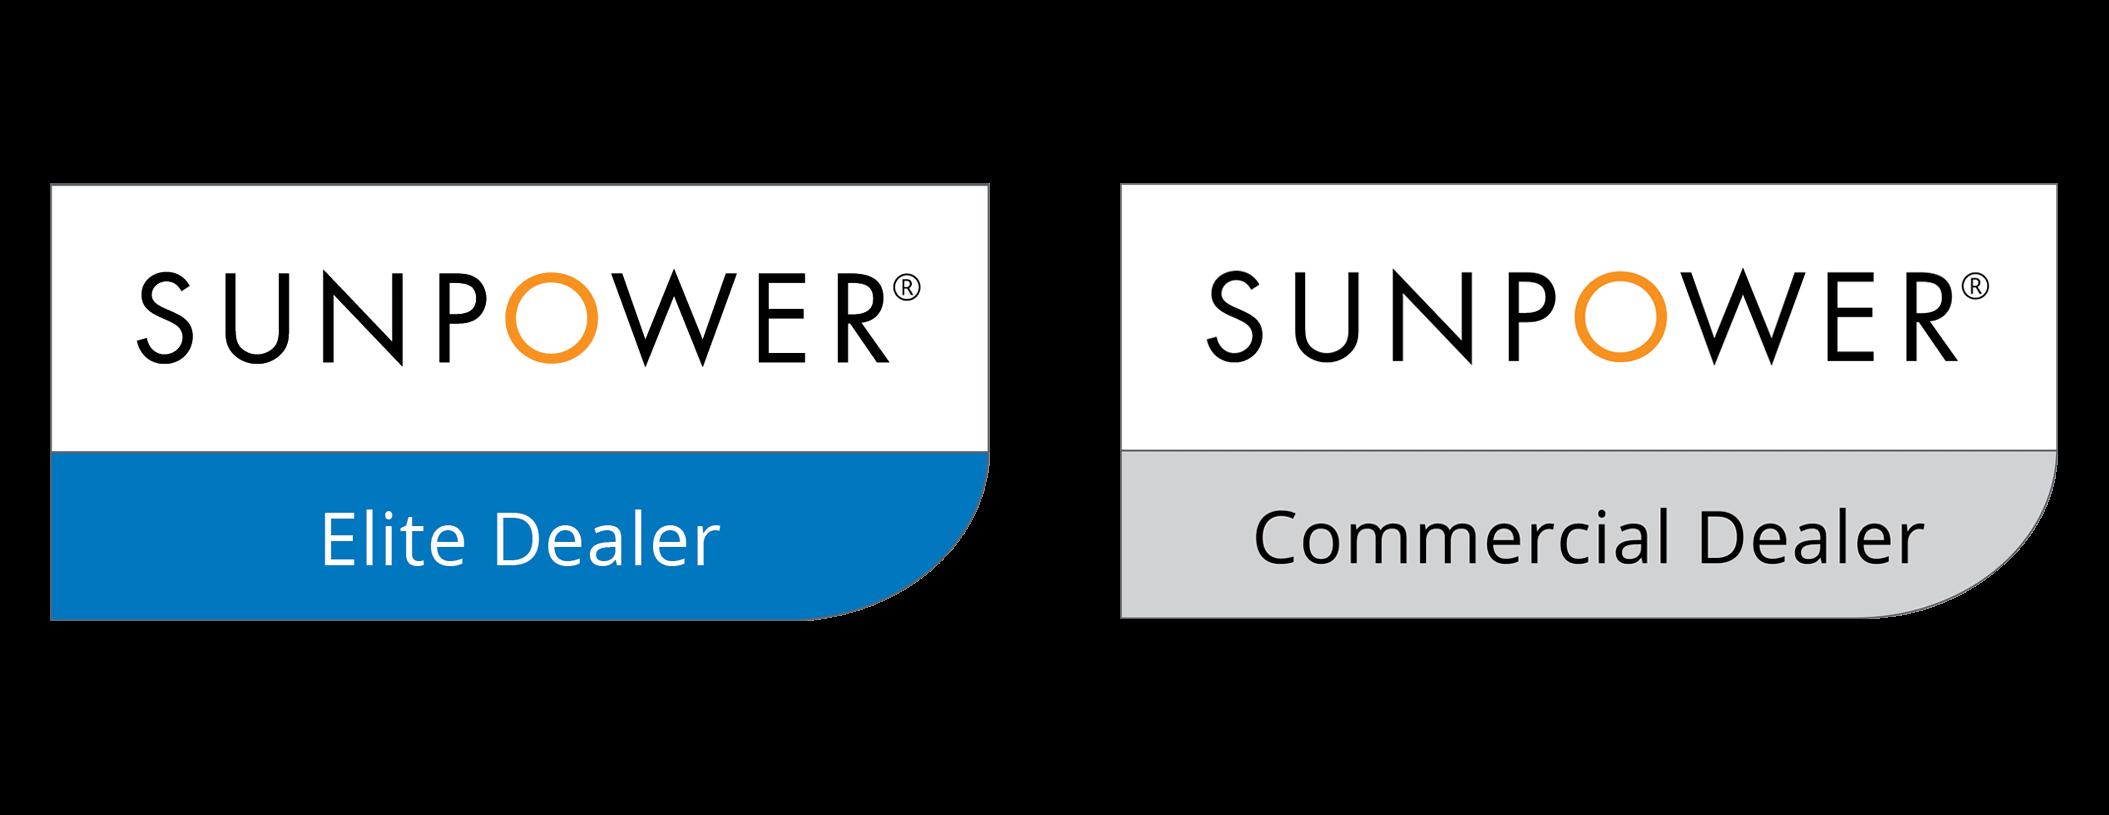 Solar Power Referrals | Scudder Solar Referral Program